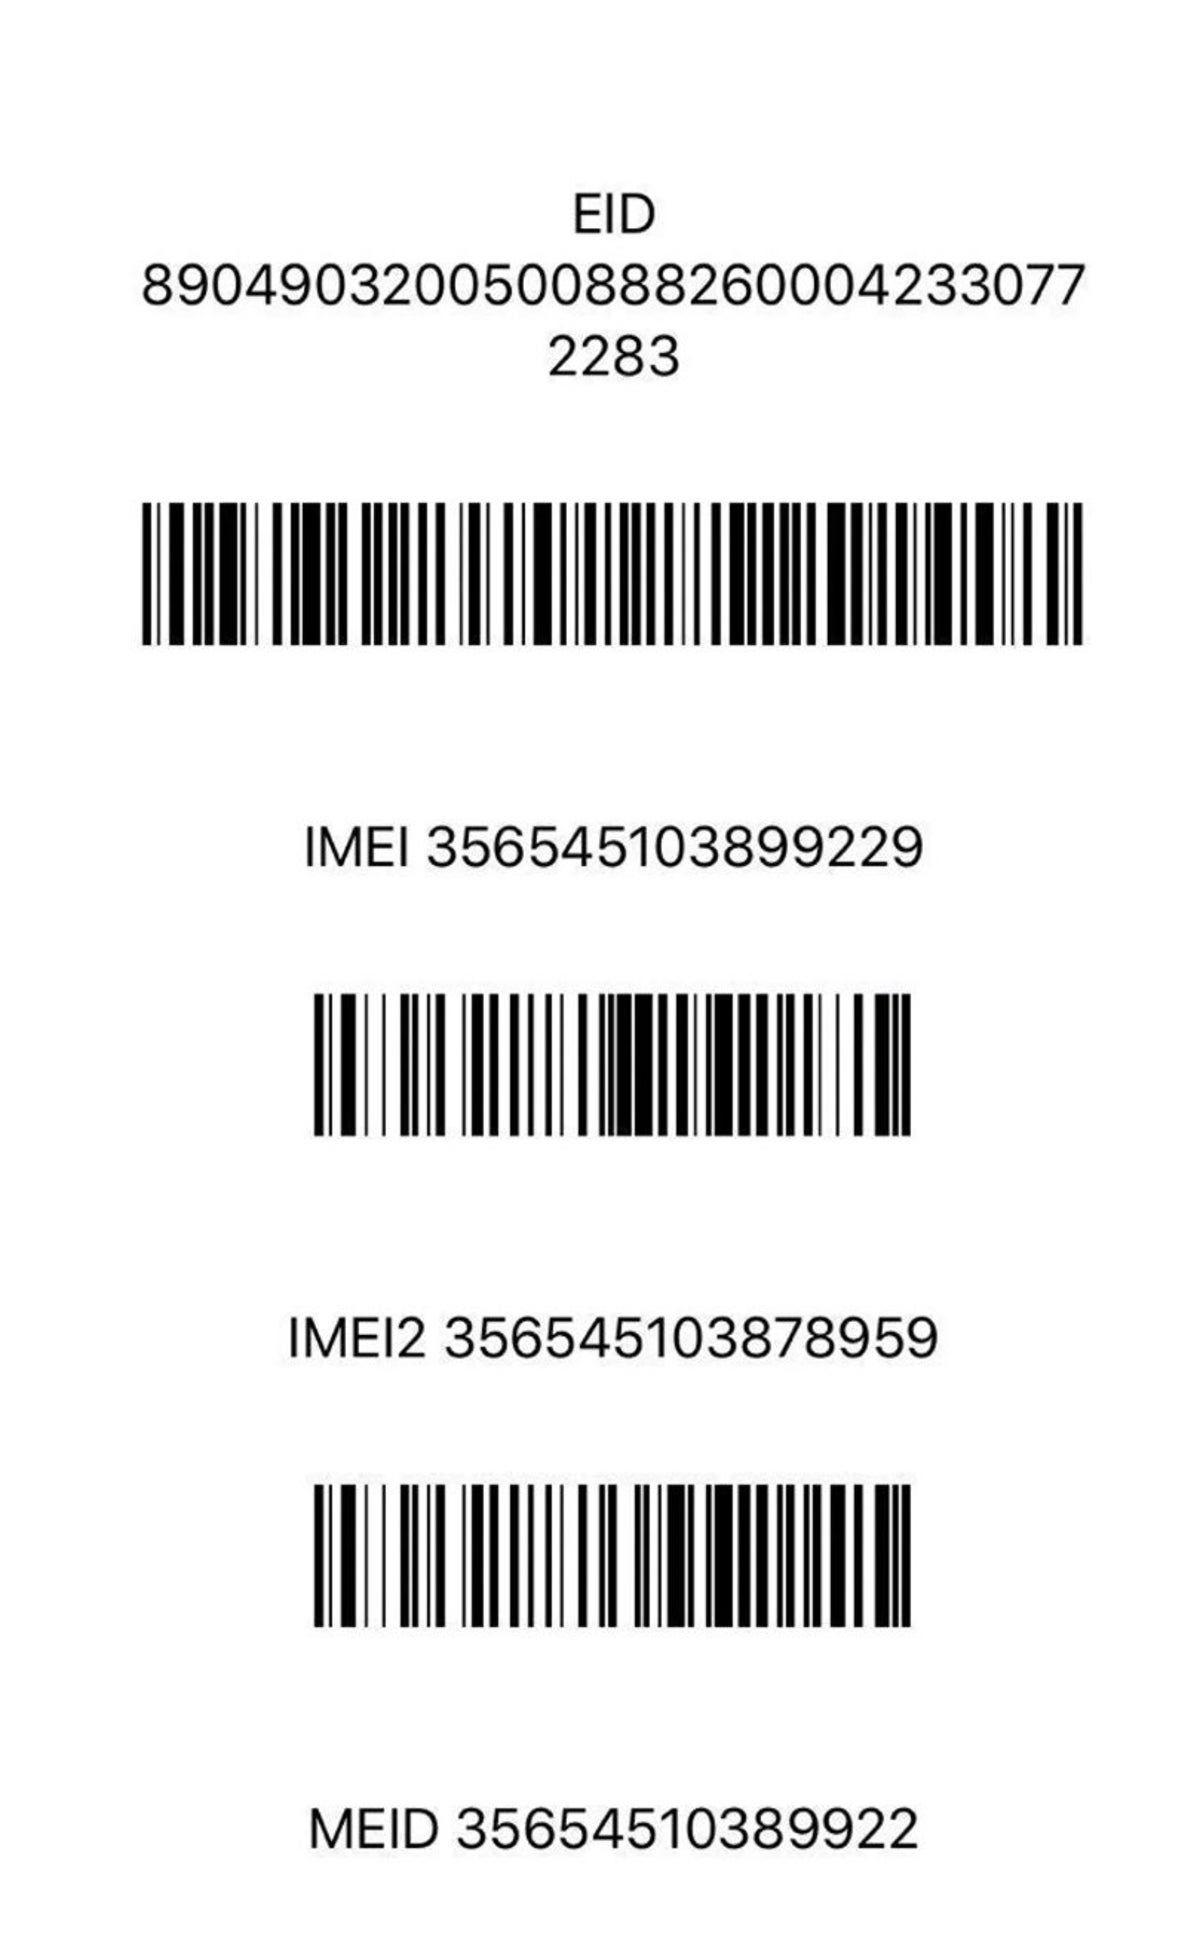 Iphone 11 Purple 128 Gb Note Pad Design Iphone Tech Company Logos